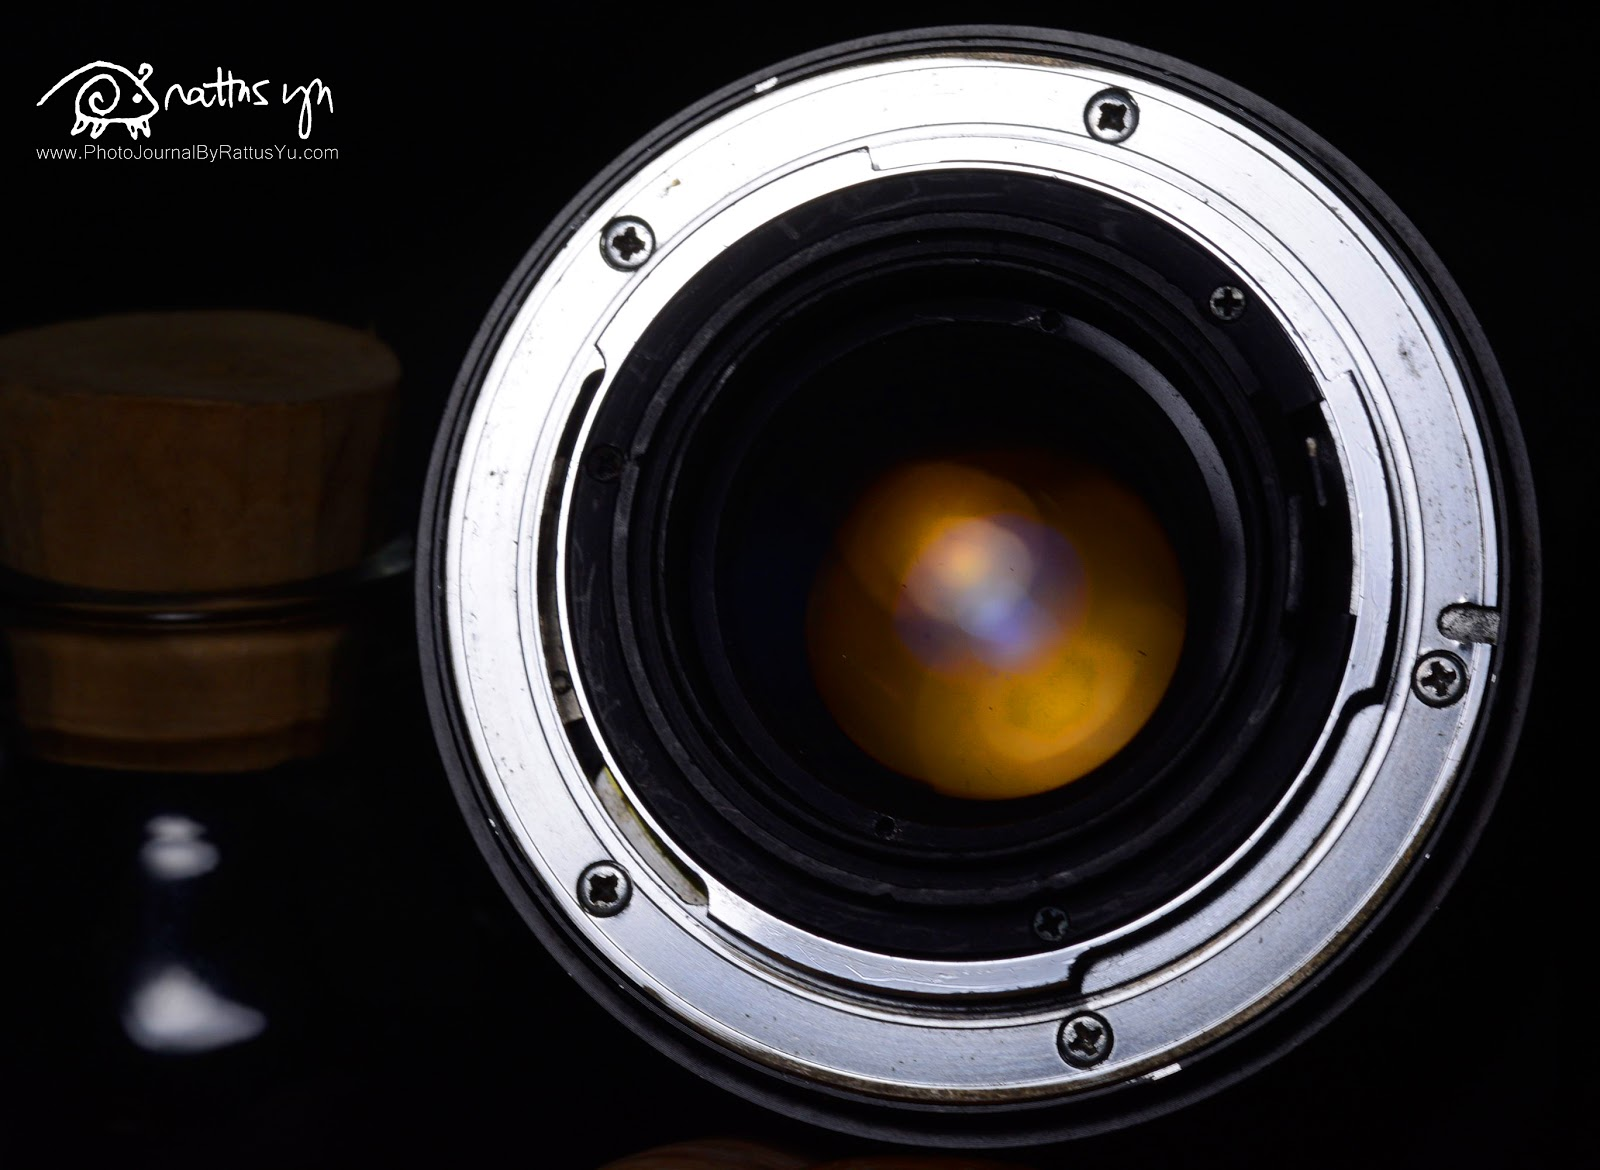 Vivitar Series 1 28-90mm f/2.8-3.5 (Komine)